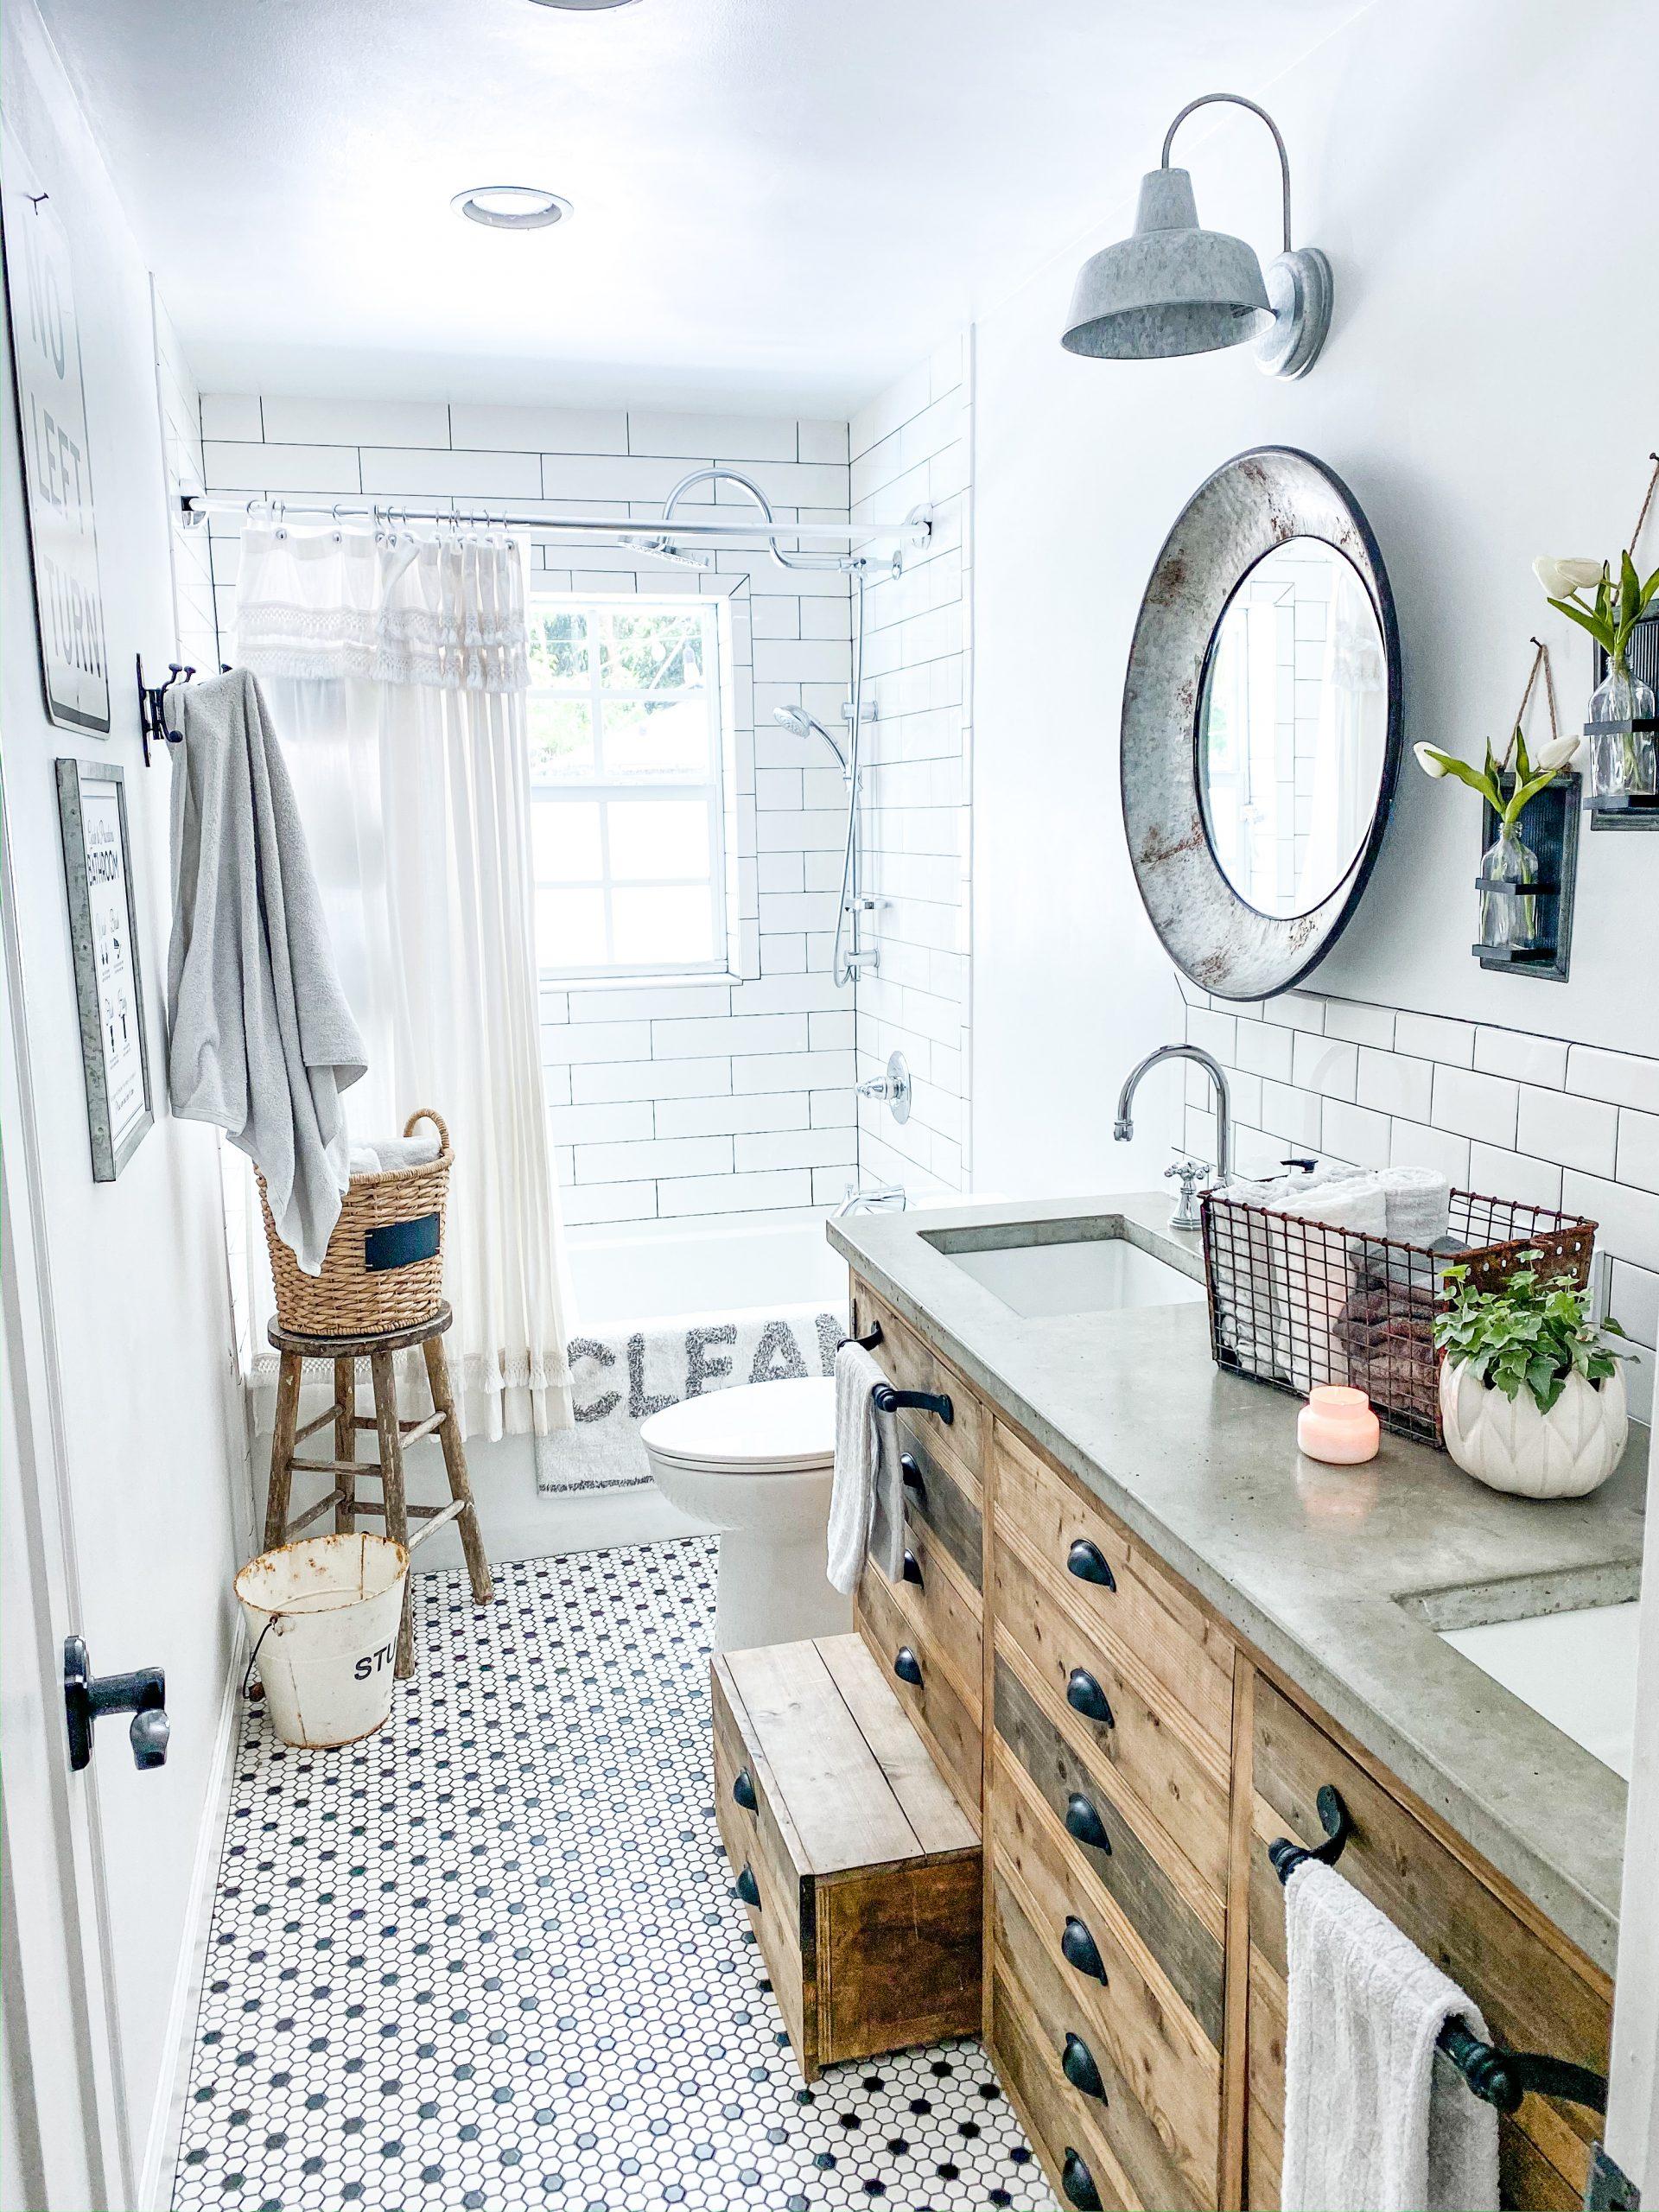 How to Get a Custom Bathroom on a Budget